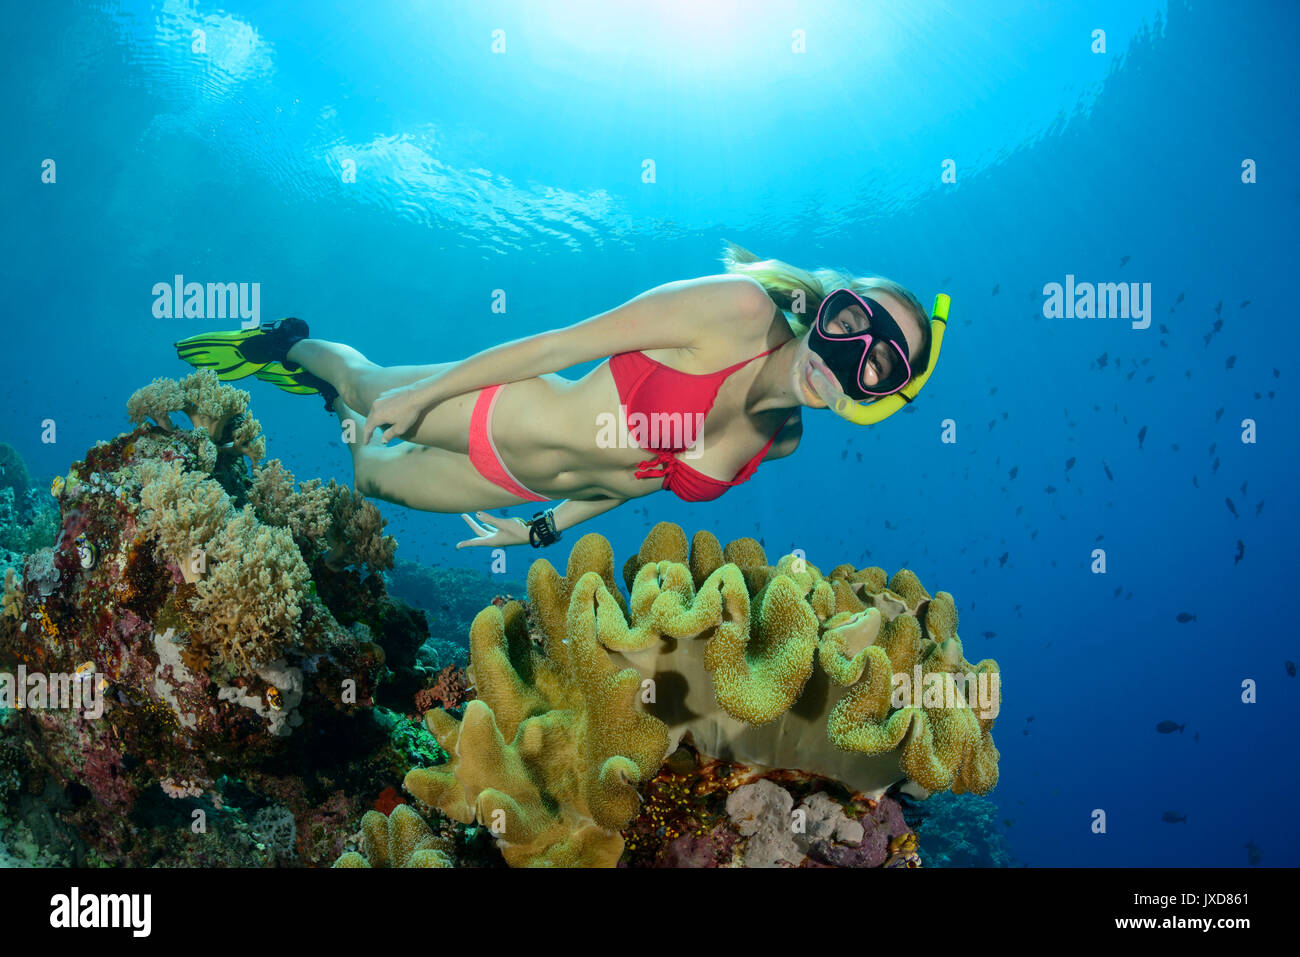 Young woman snorkeling in beautiful Coralreef on Selayar Island, Indonesia, Indian Ocean - Stock Image